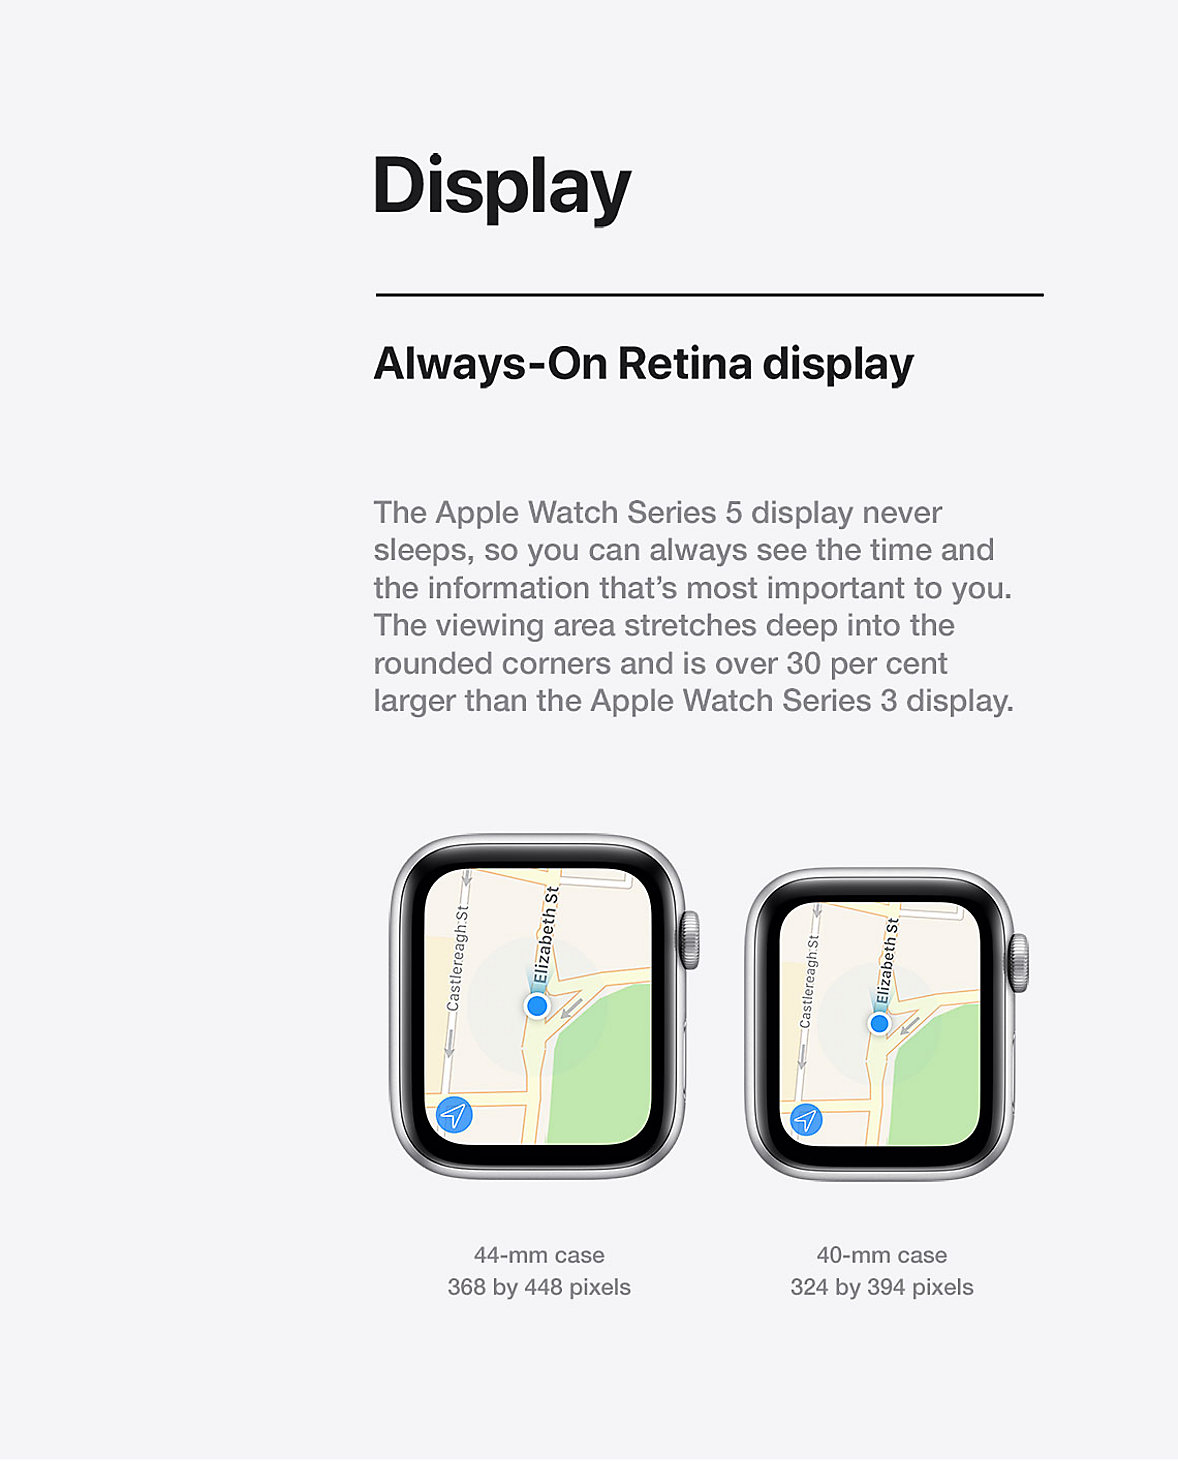 Apple Watch Display Always On Retina